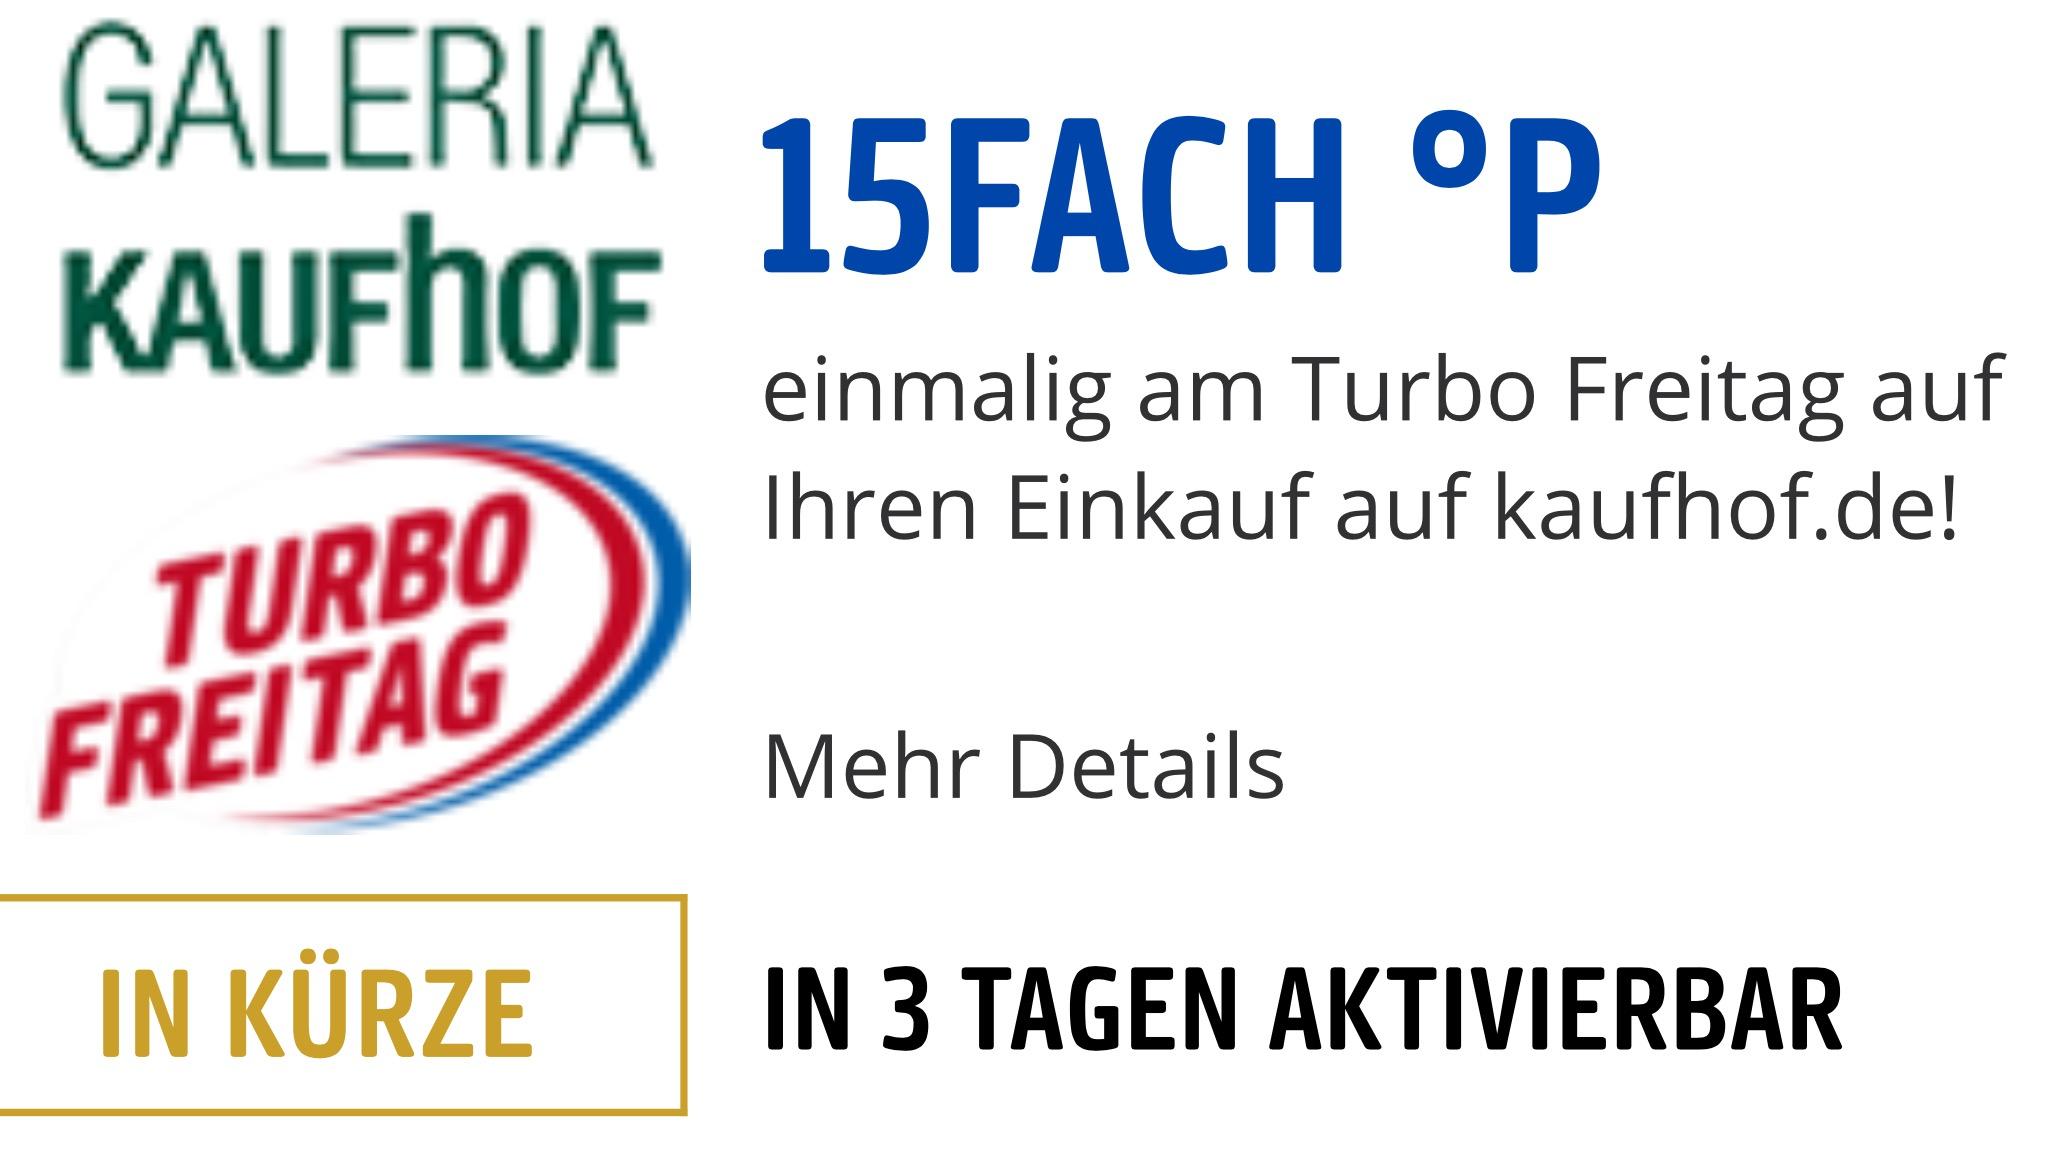 Payback 15fach Punkte Galeria Kaufhof am Turbo Freitag